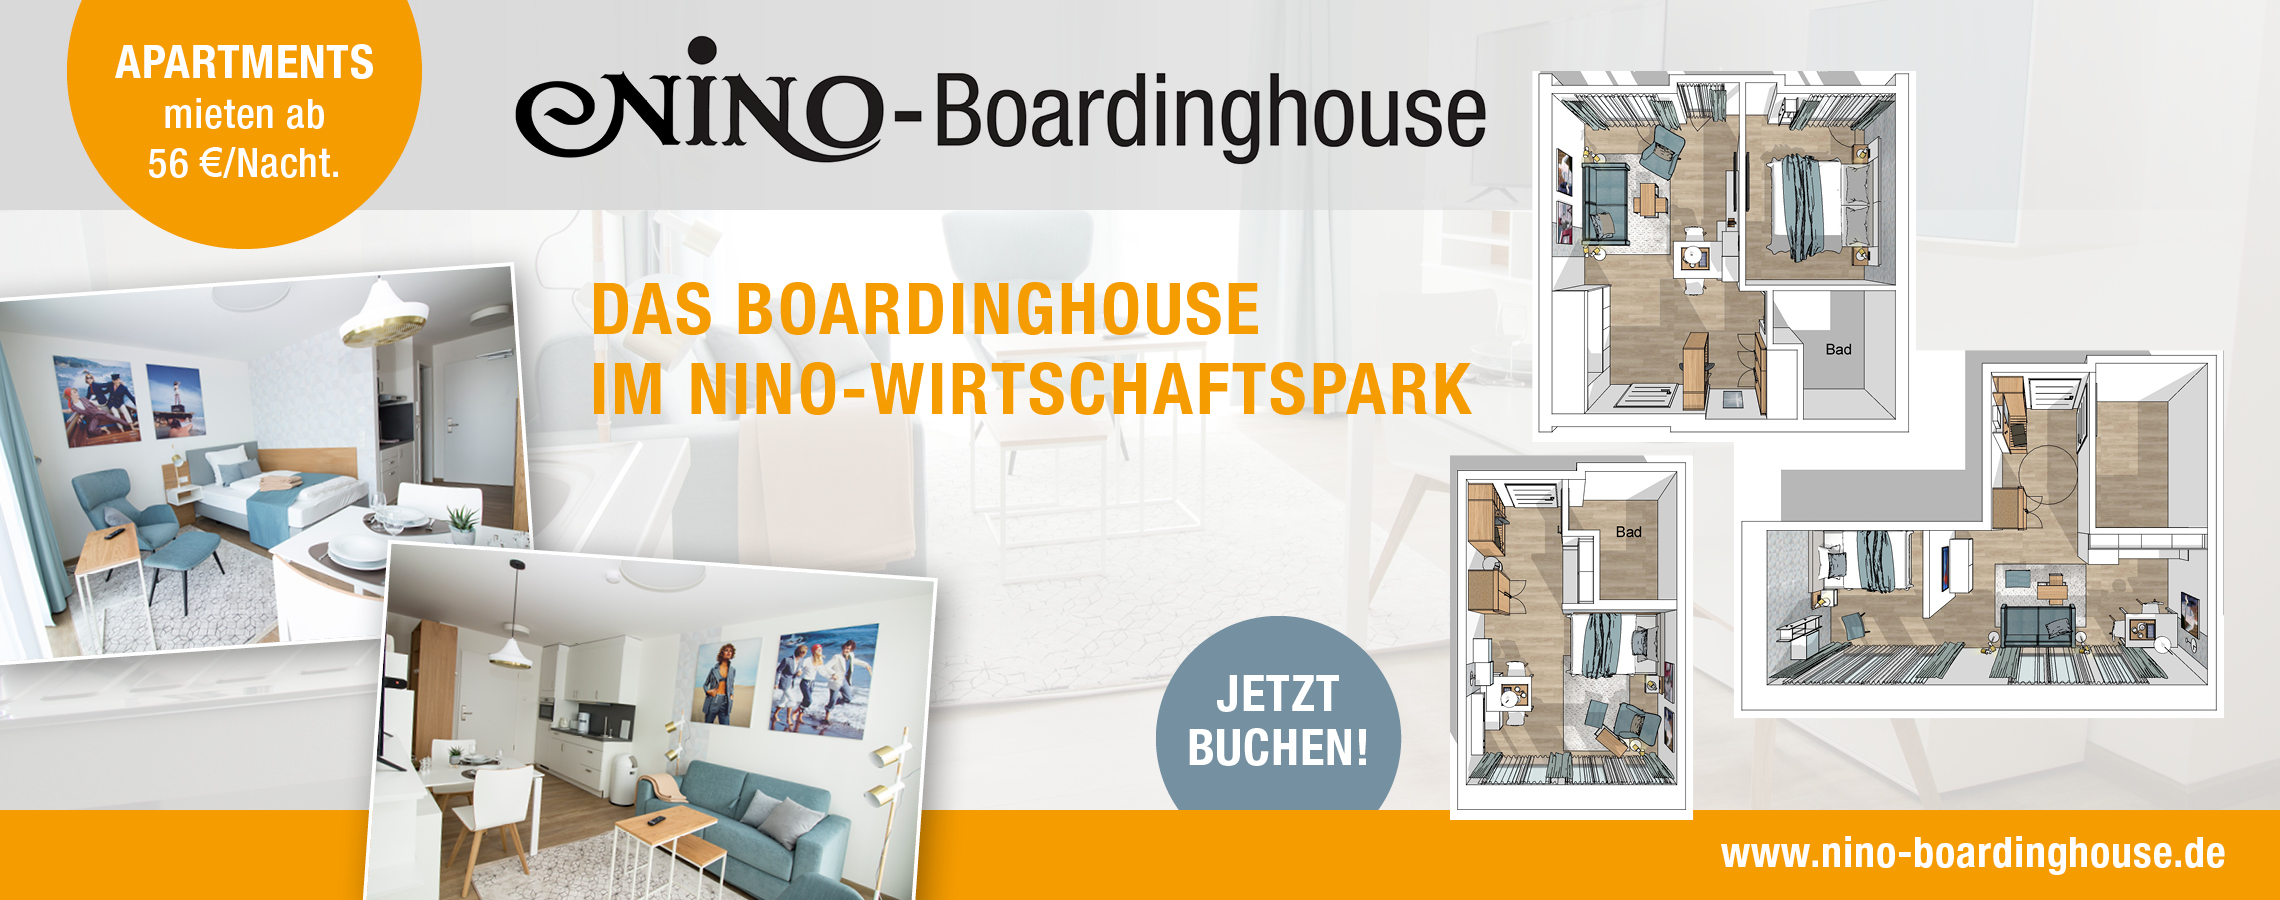 Nino Boardinghouse 2021